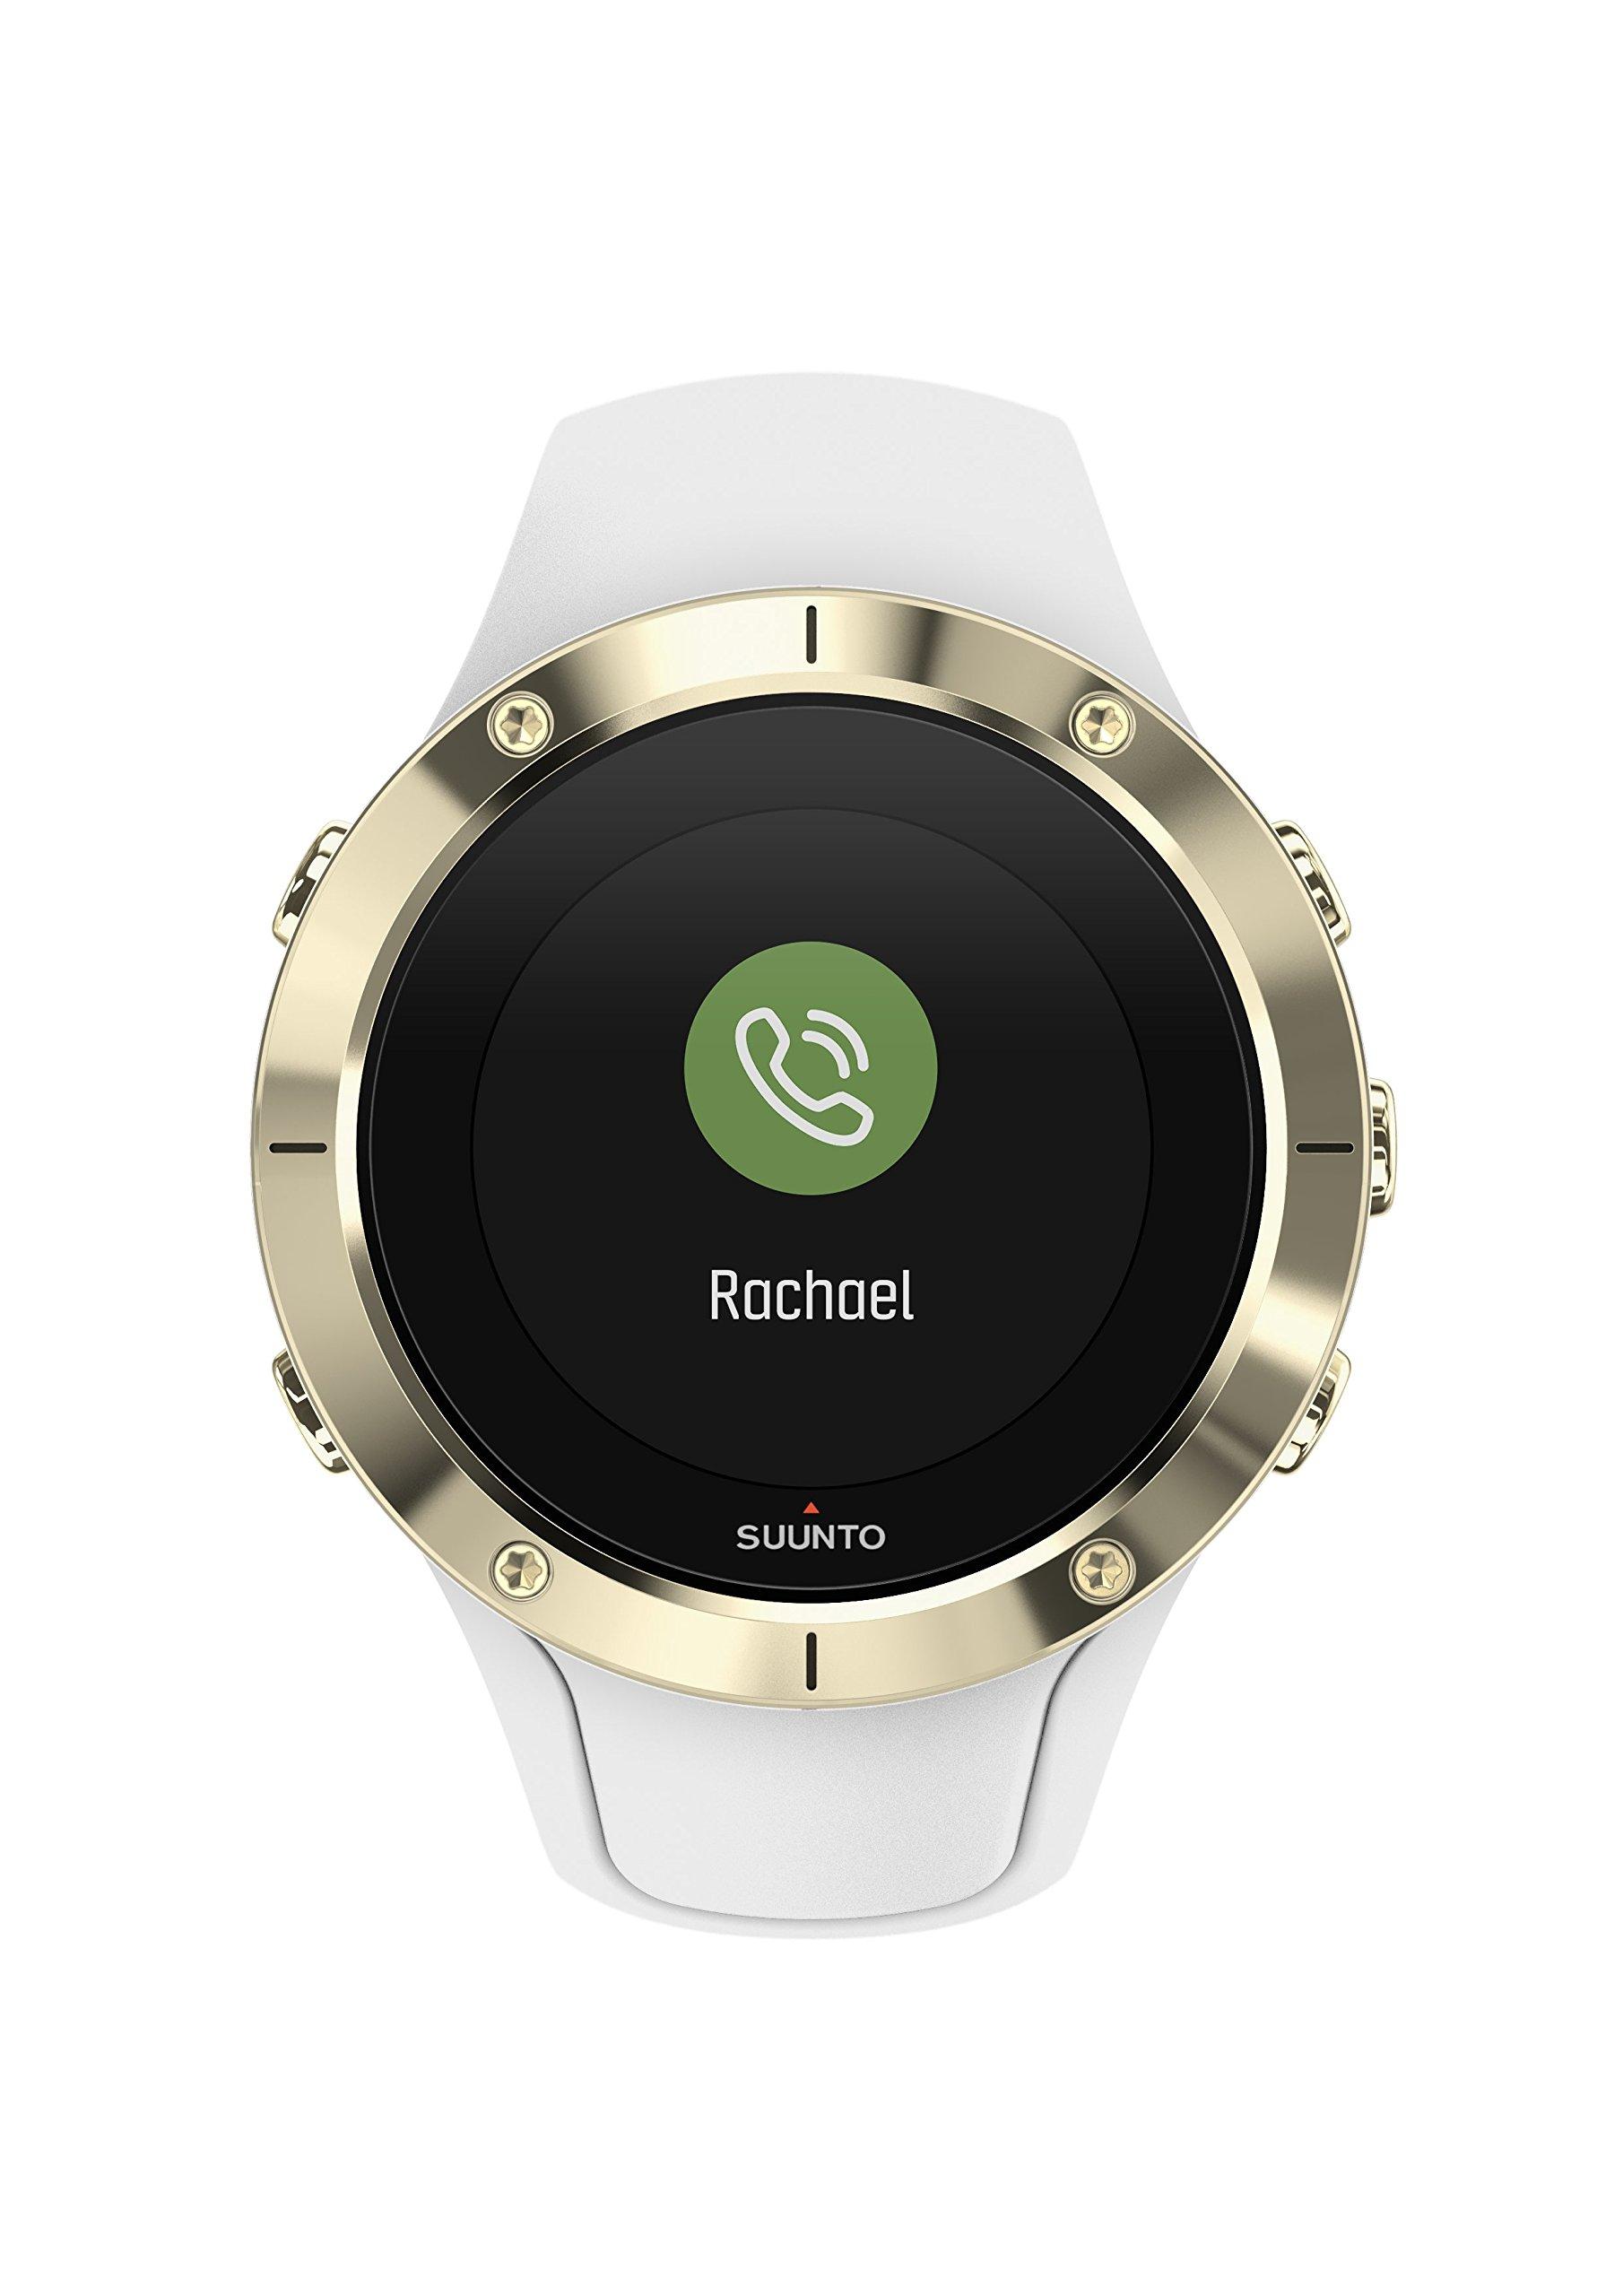 Suunto Spartan Trainer Wrist HR Multisport GPS Watch (Gold) by Suunto (Image #11)